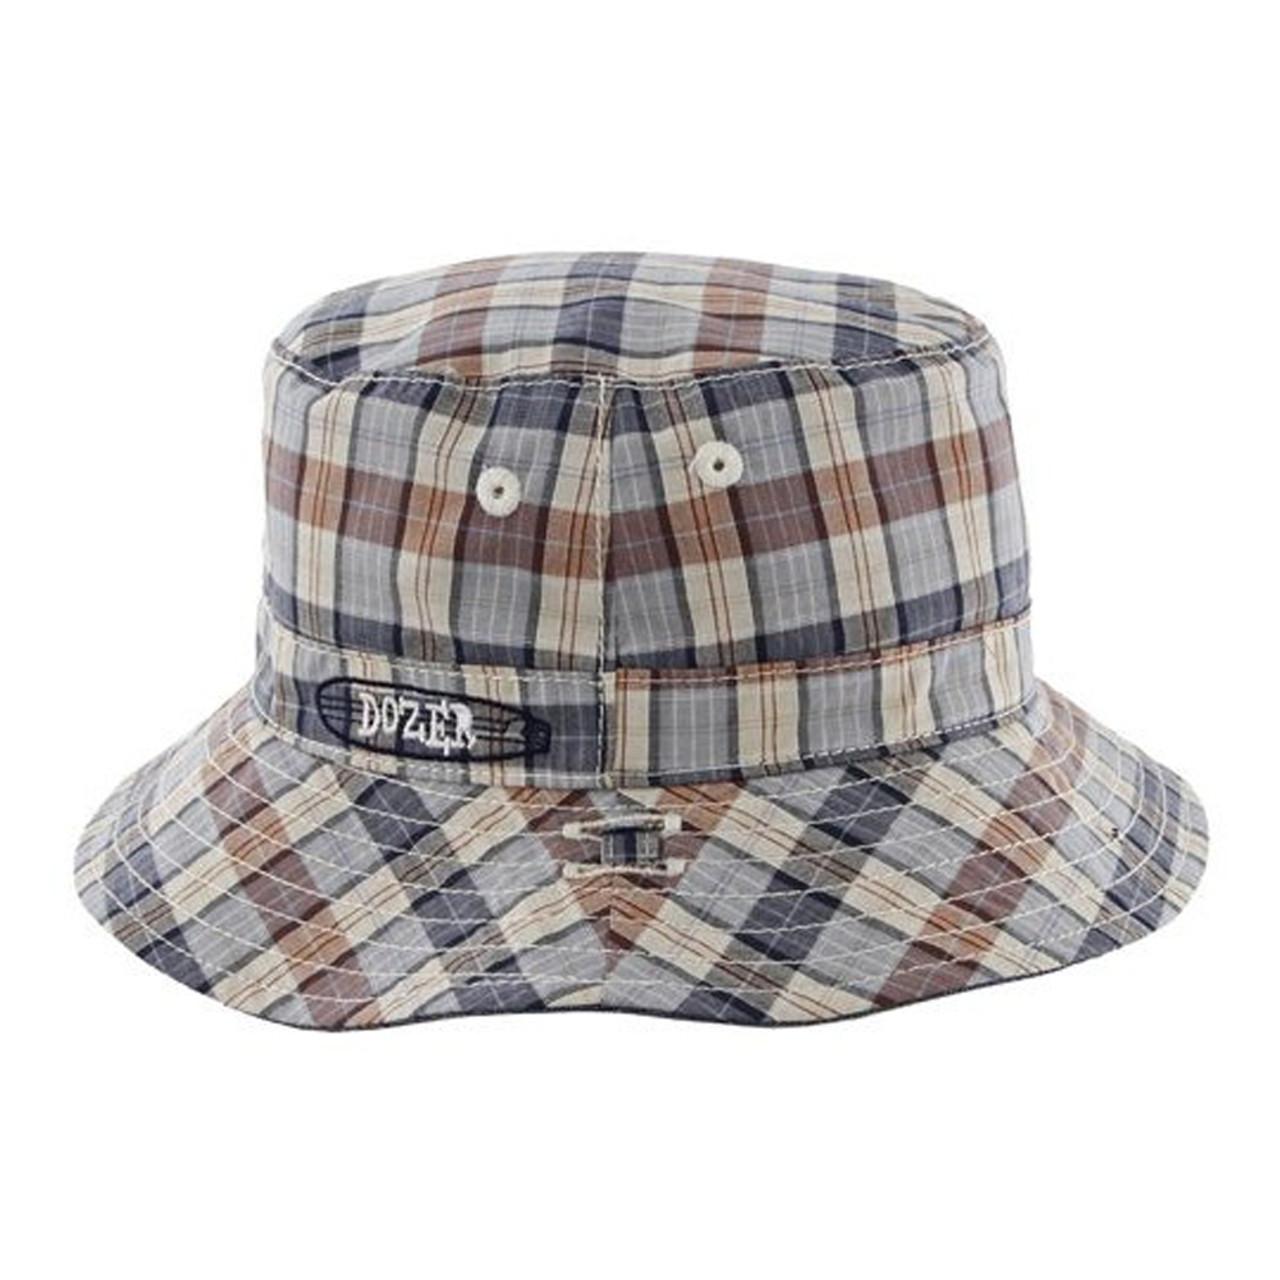 d265bd41bf8 Dozer Baby Boys Bucket Hat - Duke (SM) - Dear-Born Baby